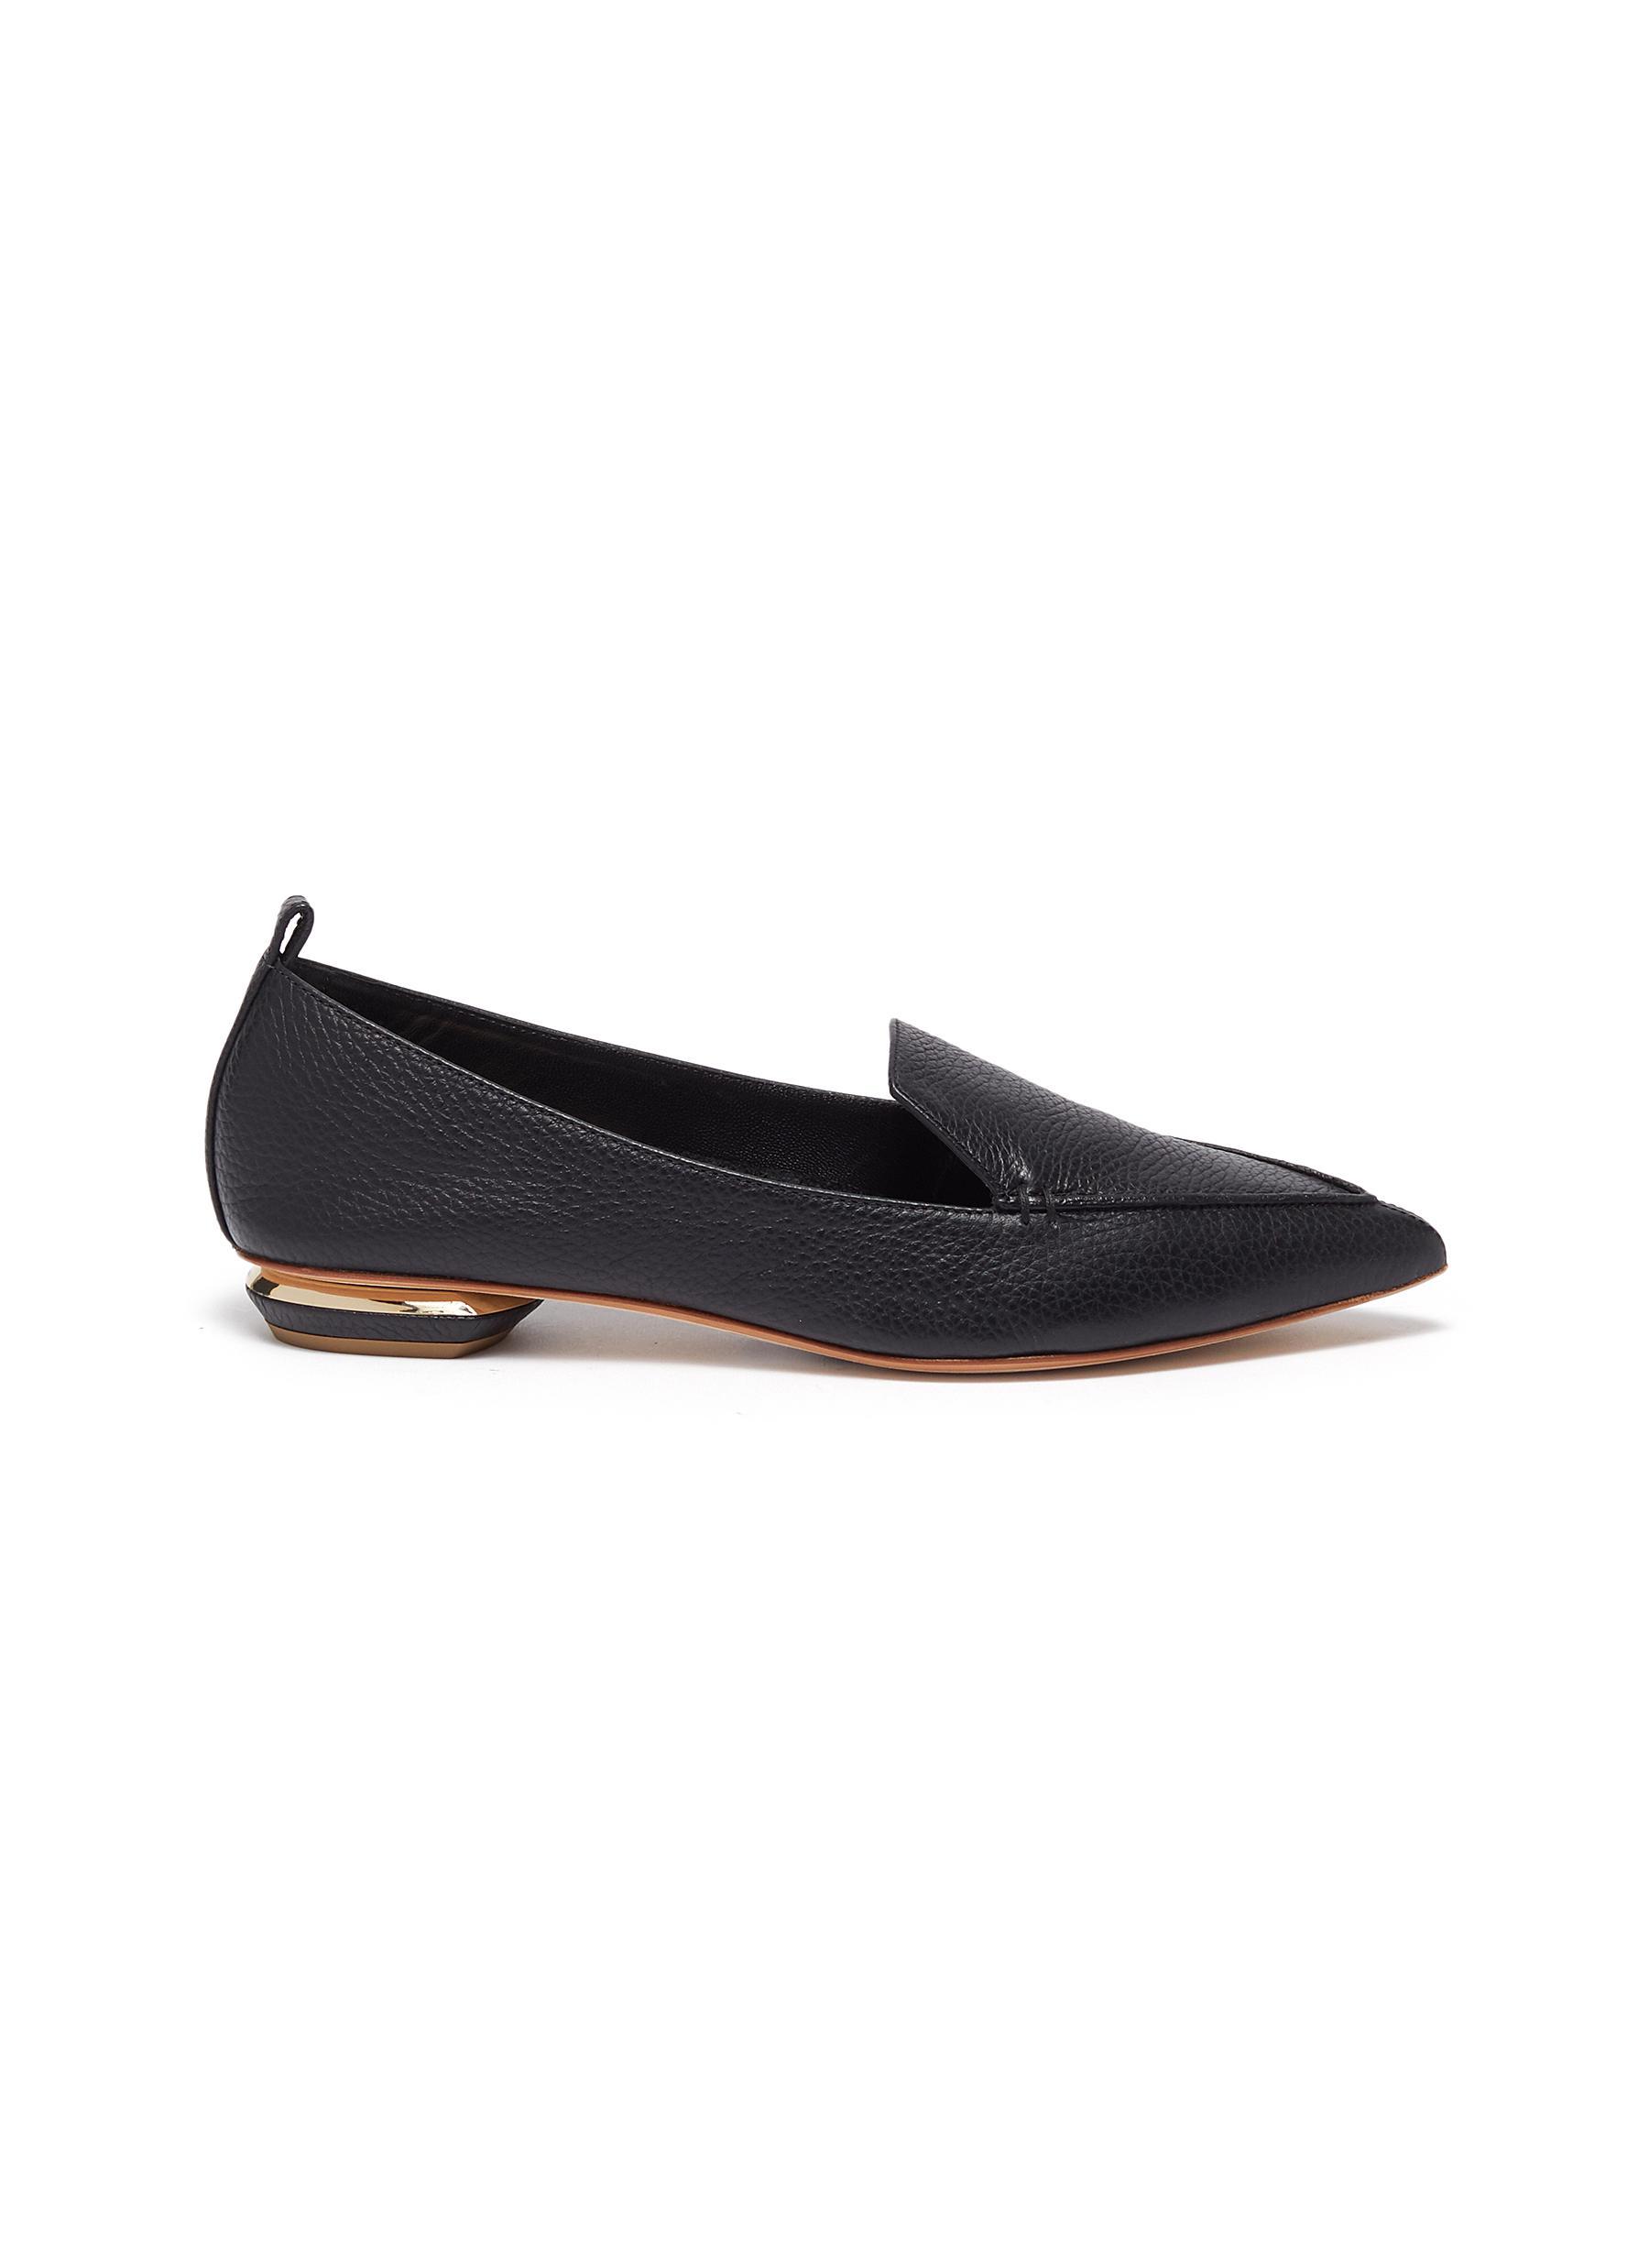 Nicholas Kirkwood Flats Beya panelled loafers